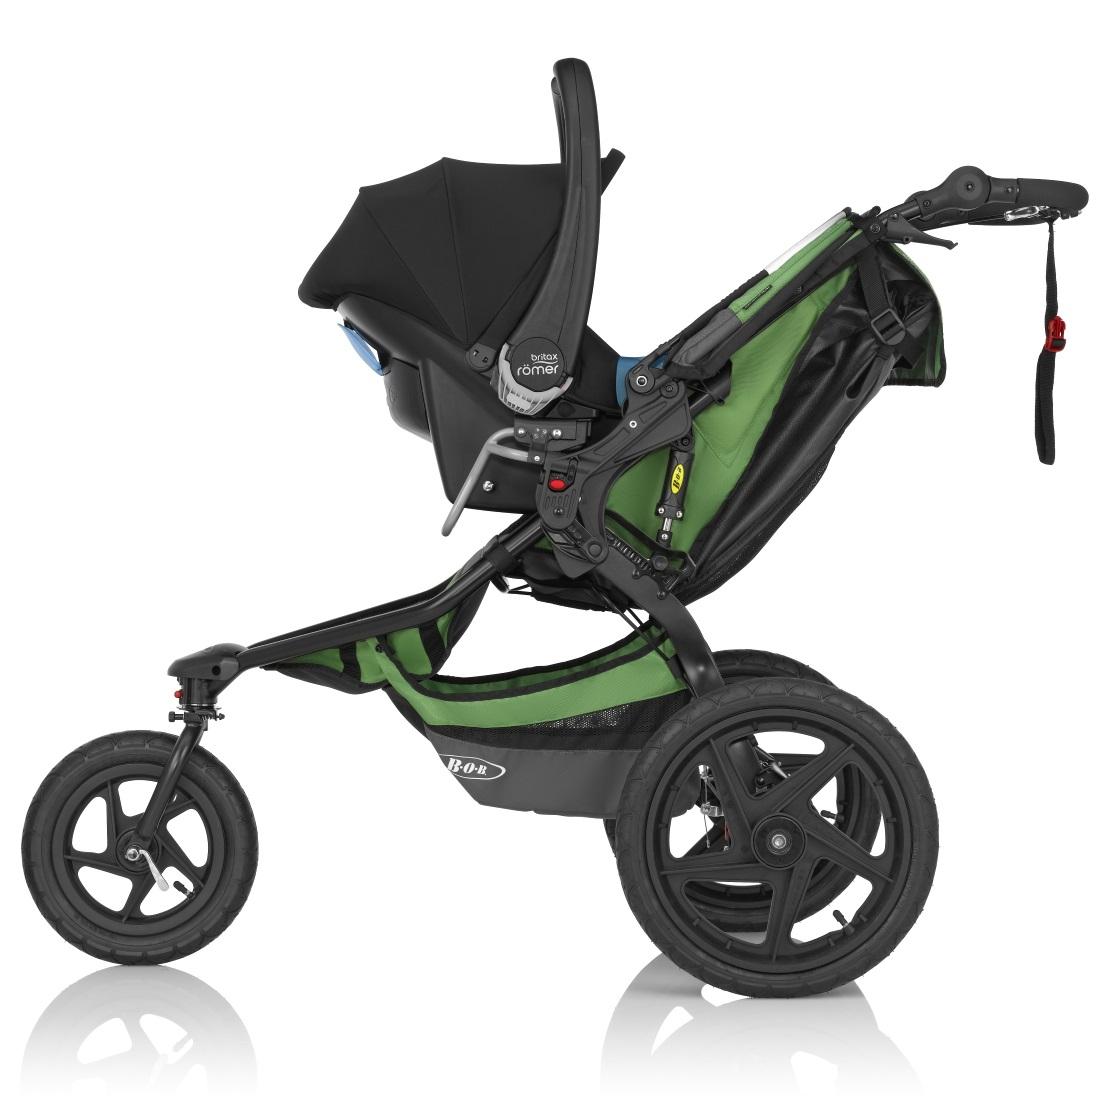 Carro bebé Britax Bob Revolution Pro Baby Stroller